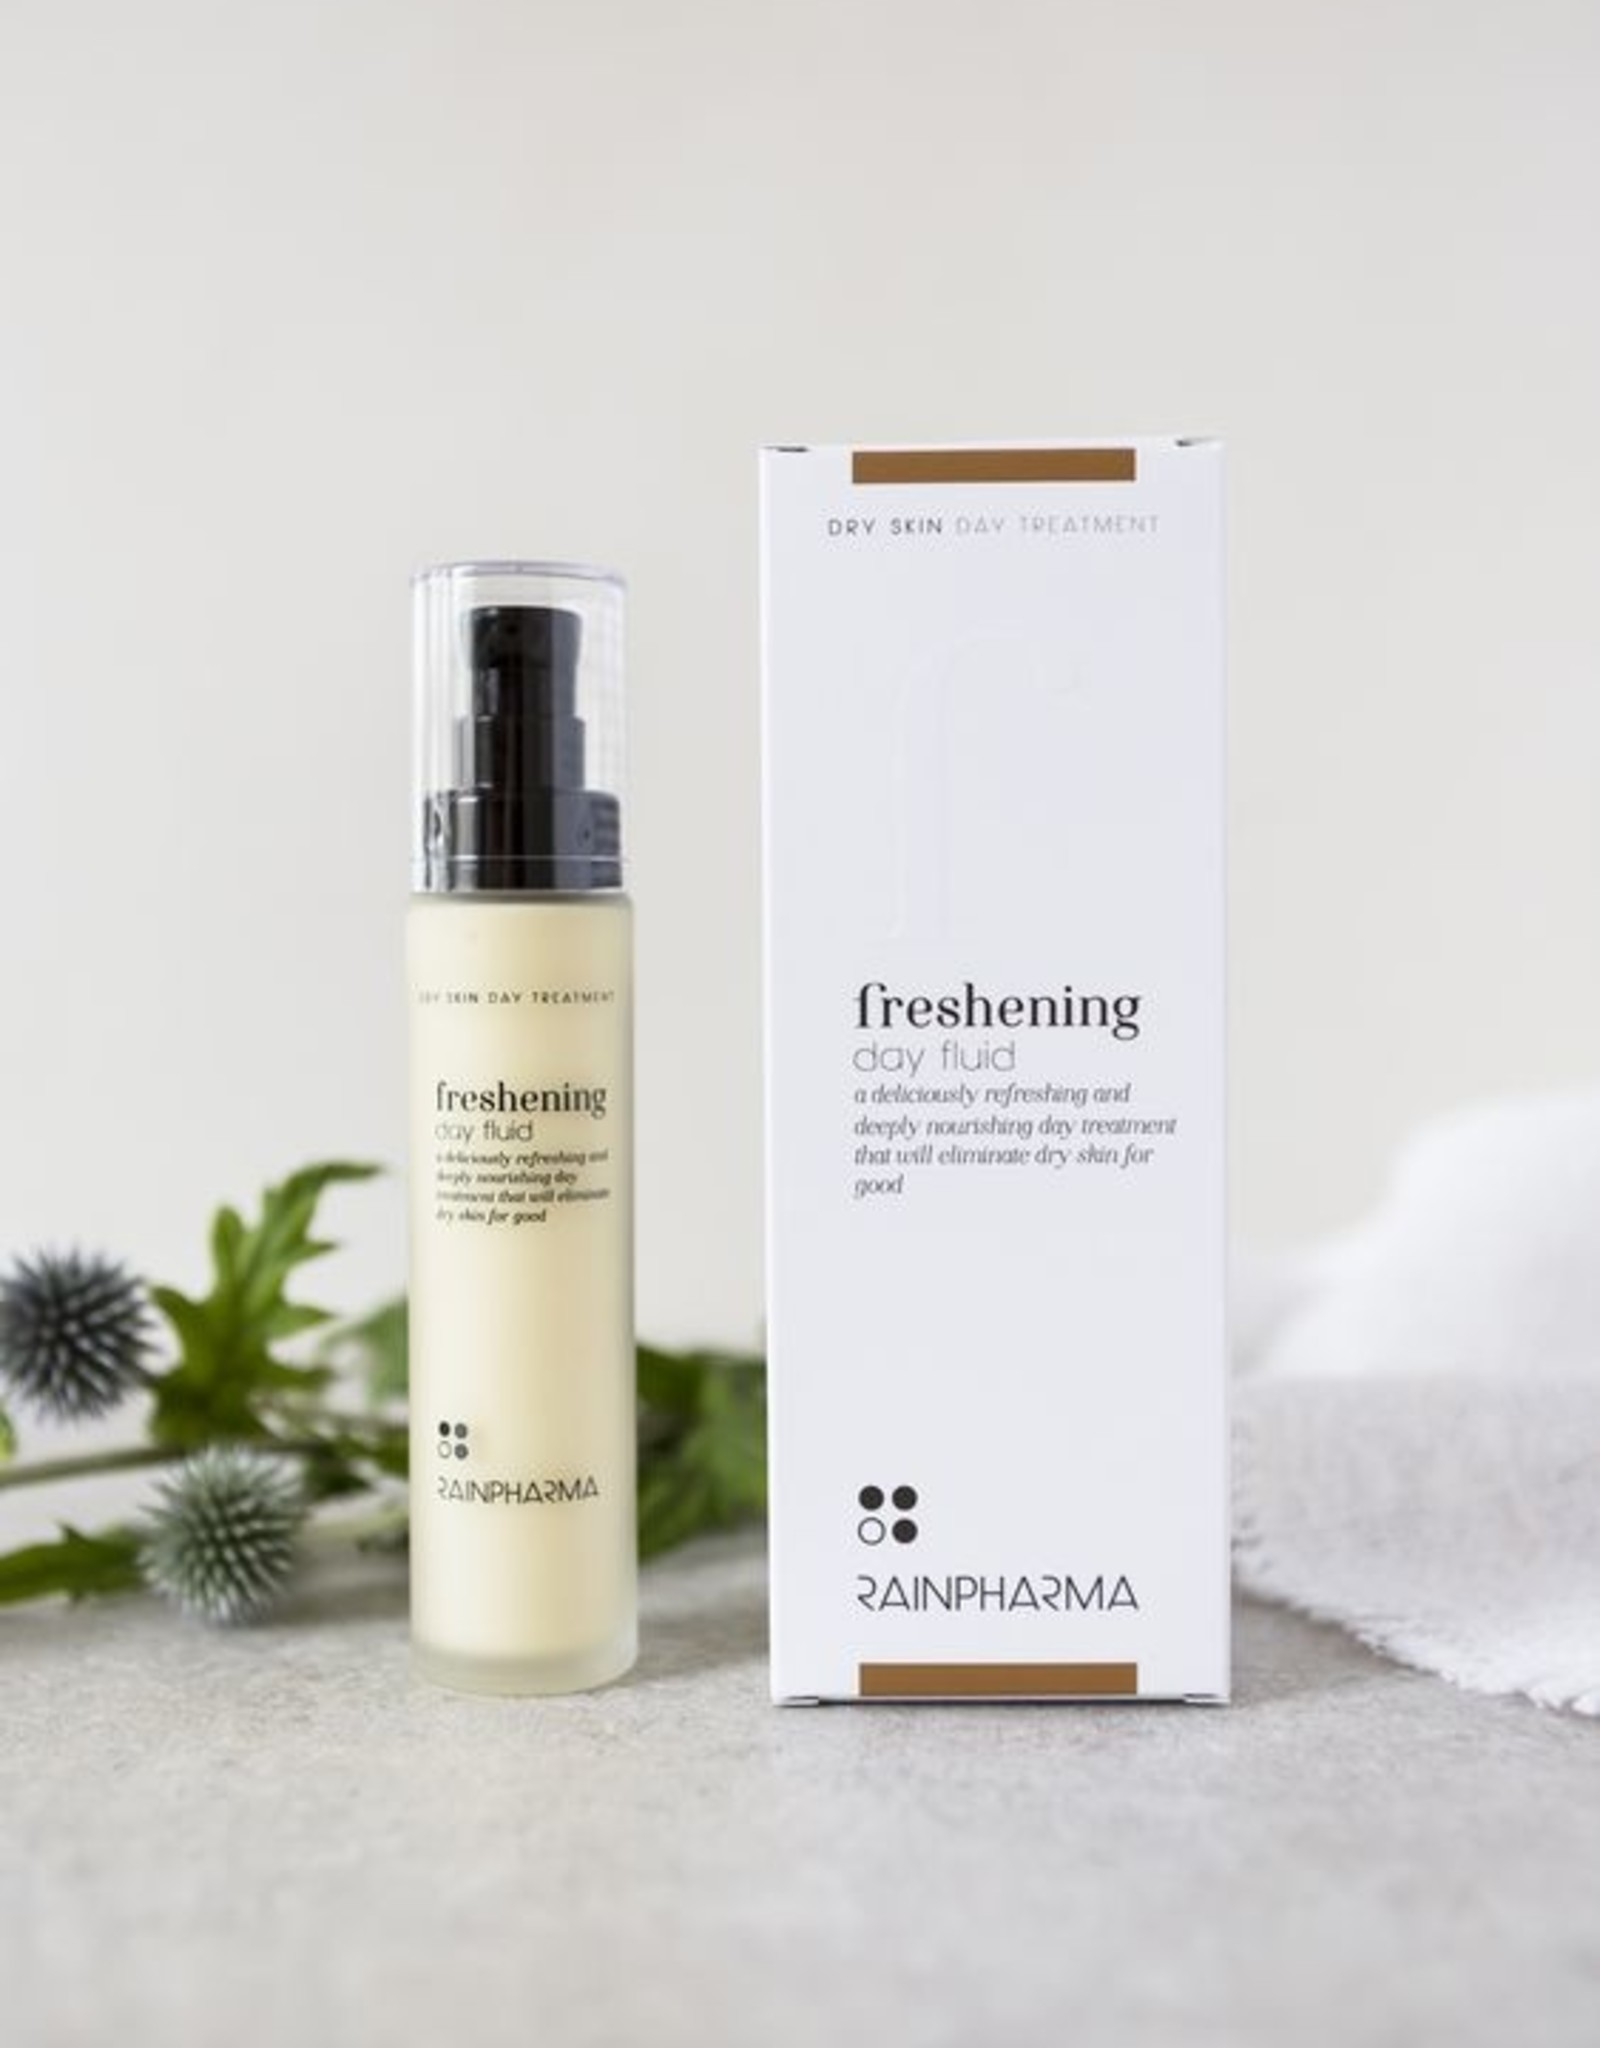 RainPharma Rainpharma - Freshening Day Fluid 50ml